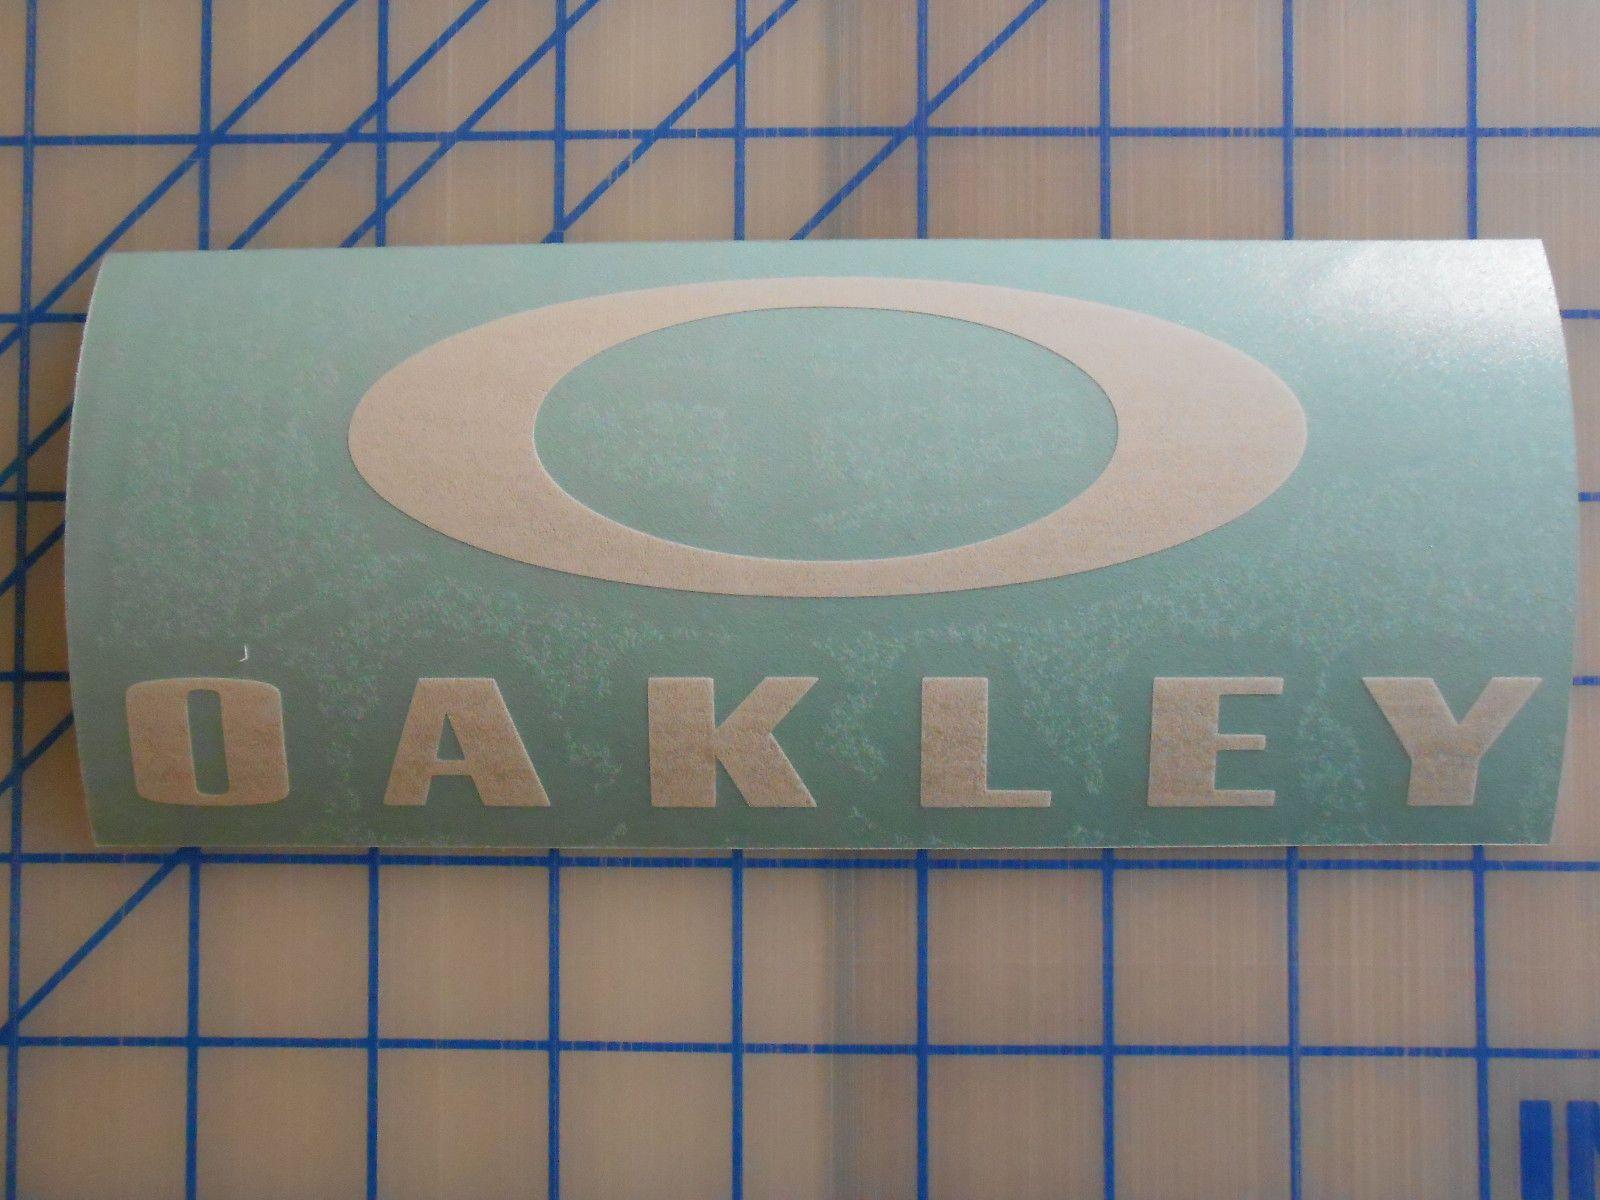 cf4c6cc53a  2.99 - Oakley Decal Sticker 5.5